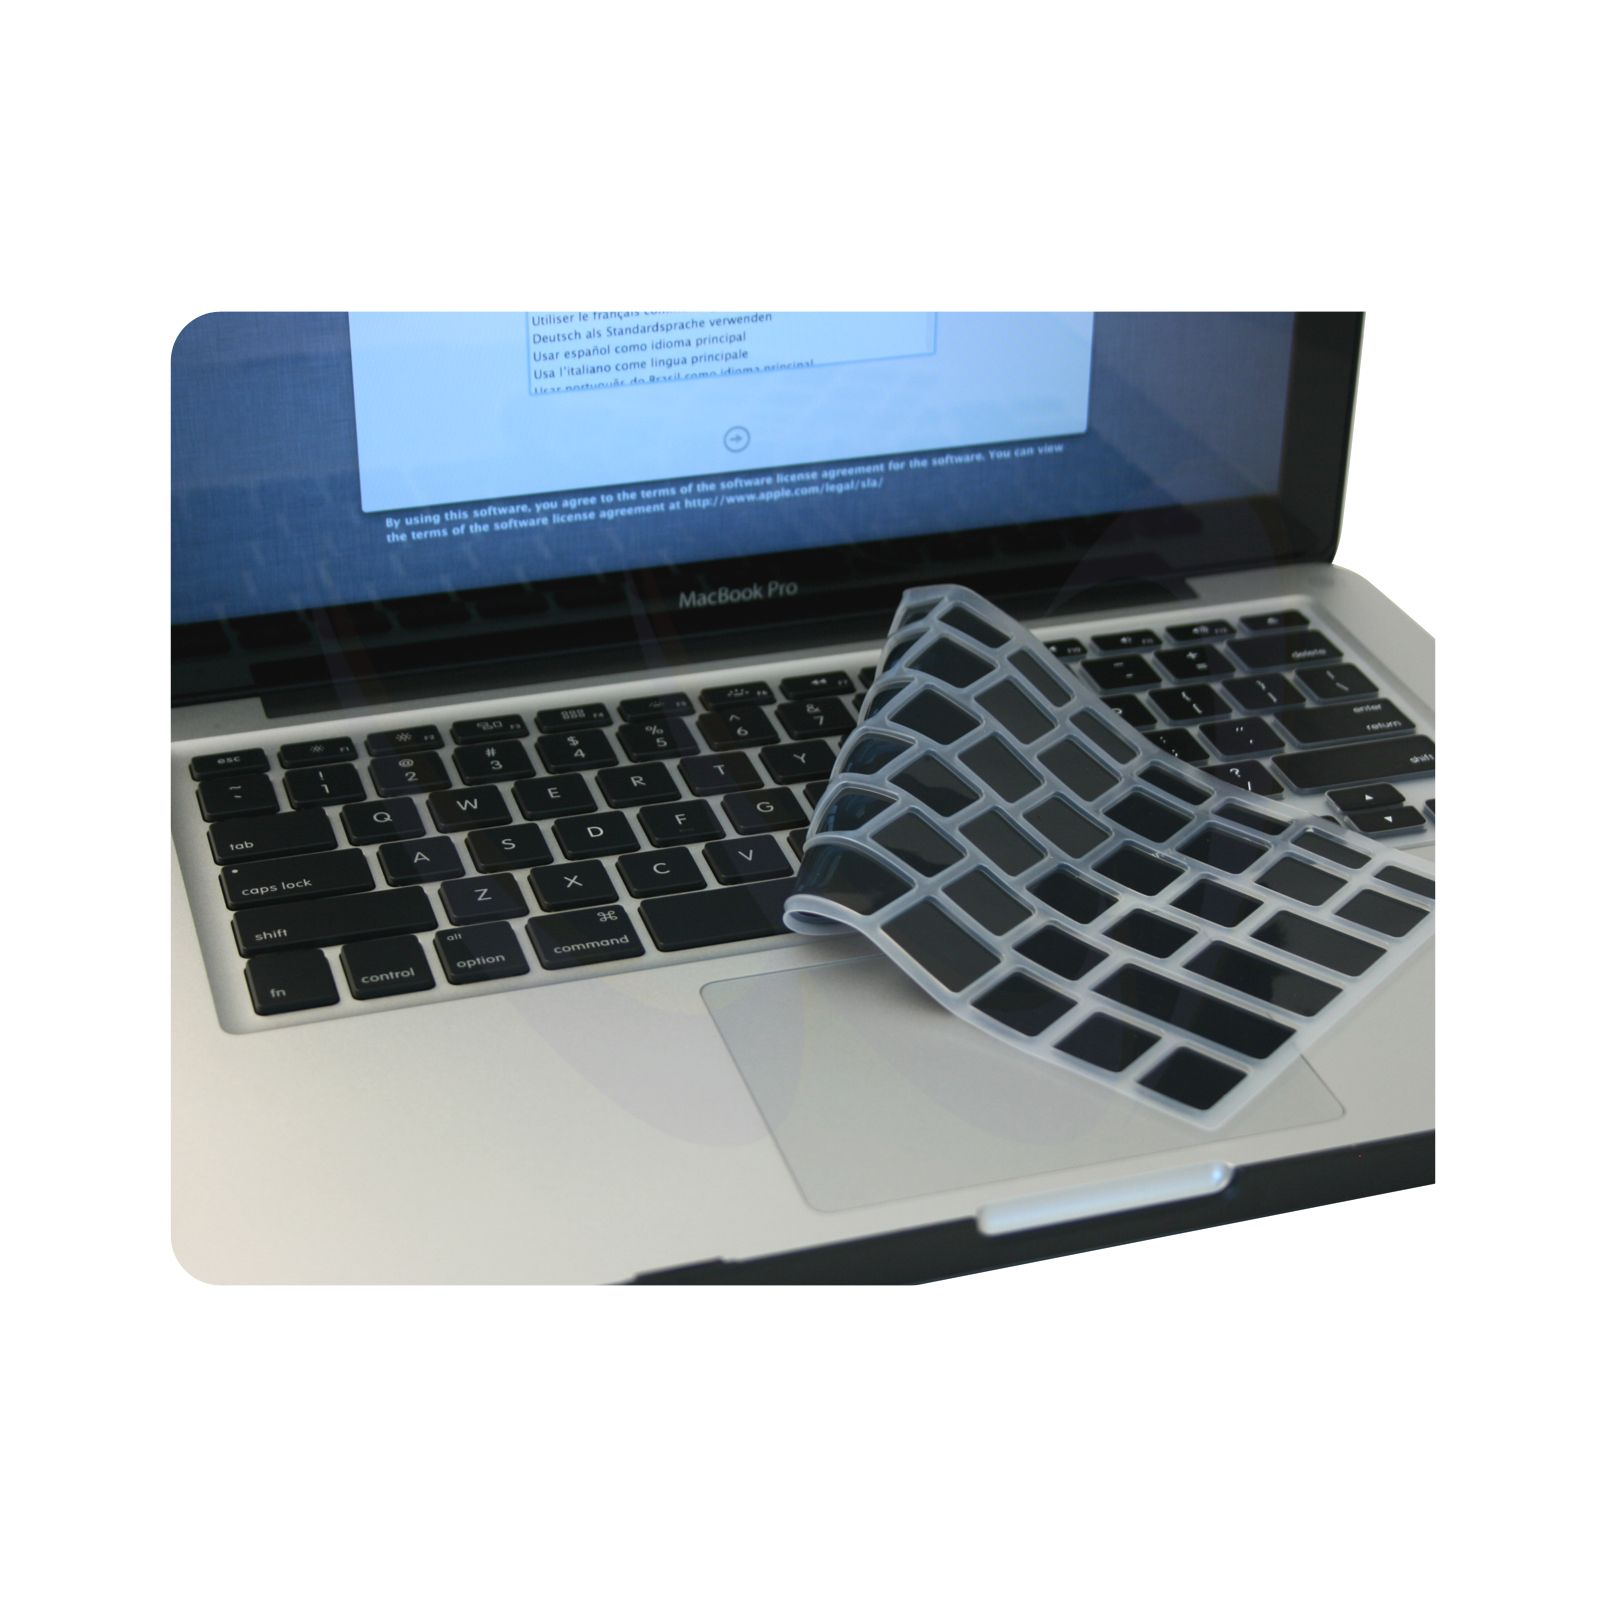 Keyboard Cover Skin Shield for MacBook Pro 13 15 17 inch 6131